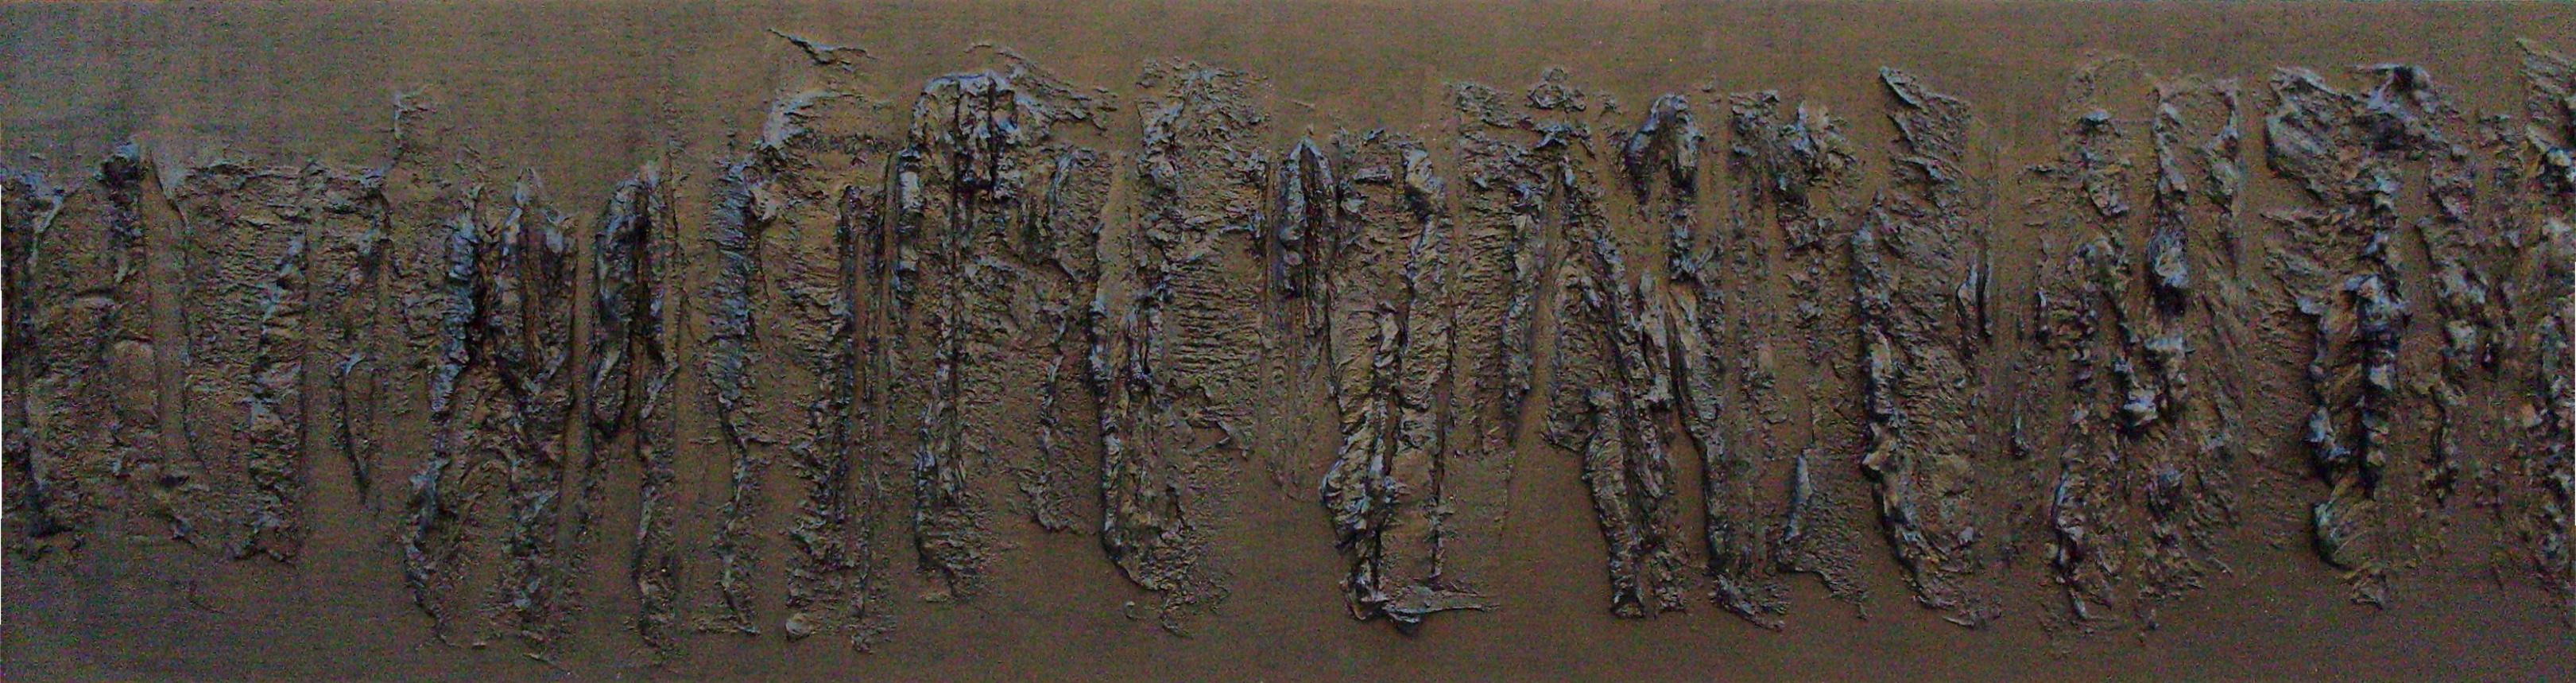 Emozioni 2, tecnica mista su tavola, 100x80, 2008